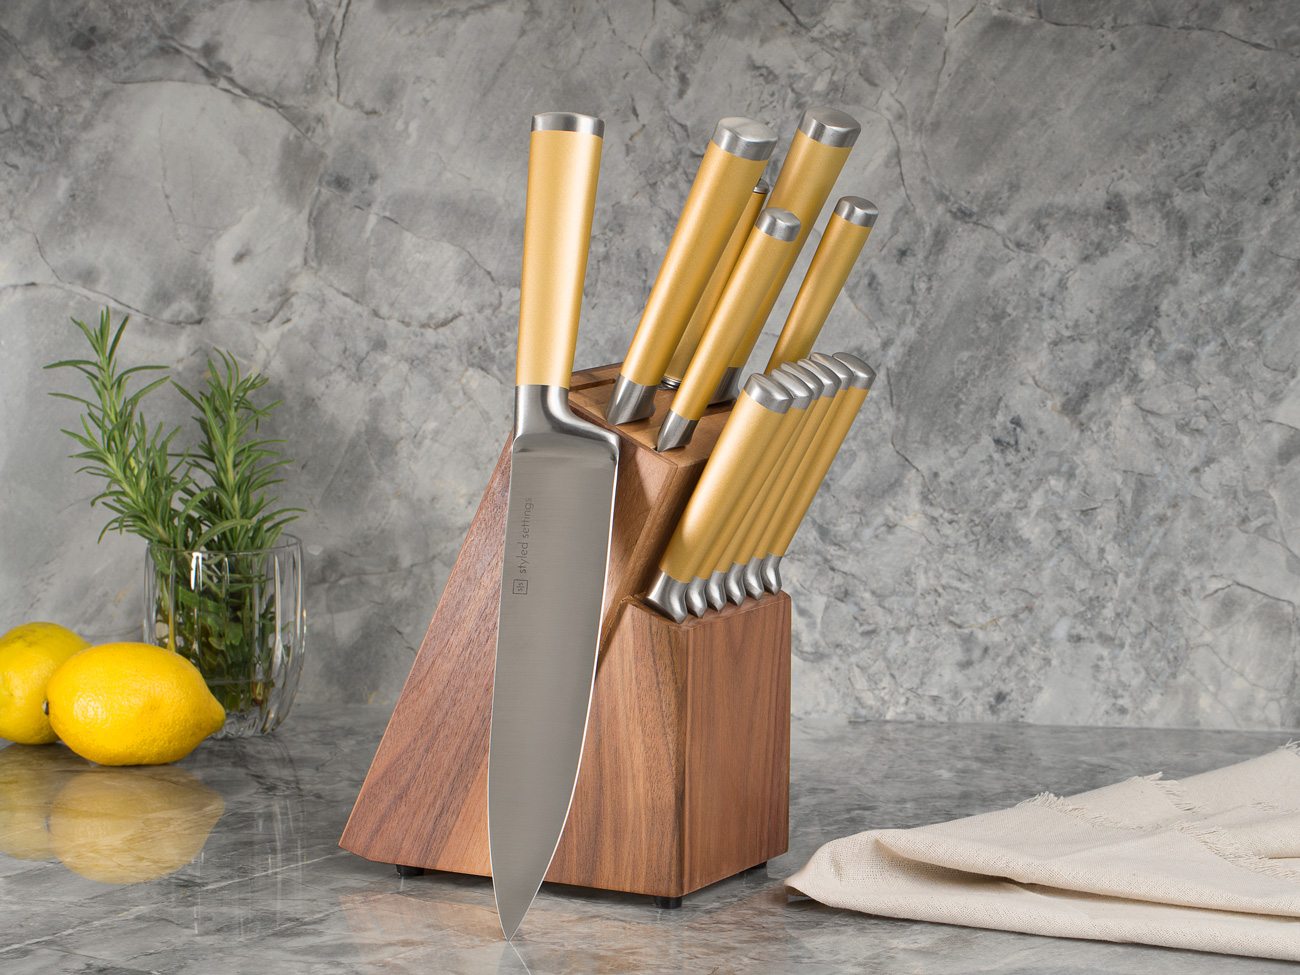 Kitchen-Lifestyle-with-Lemon